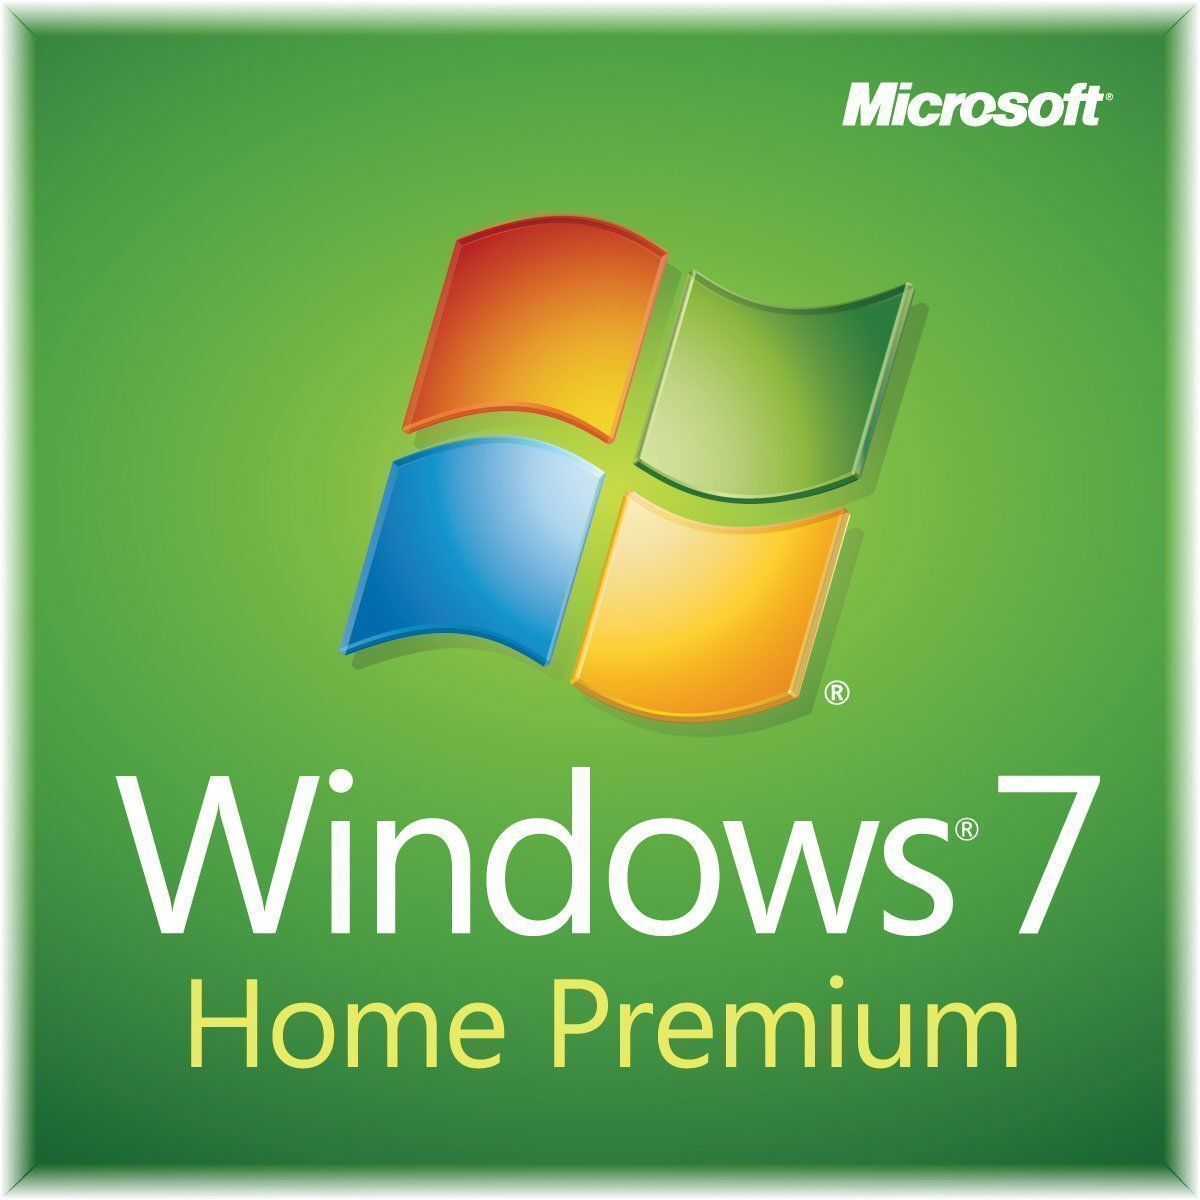 Microsoft Windows 7 Home Premium 32 & 64 Bit Full Version...